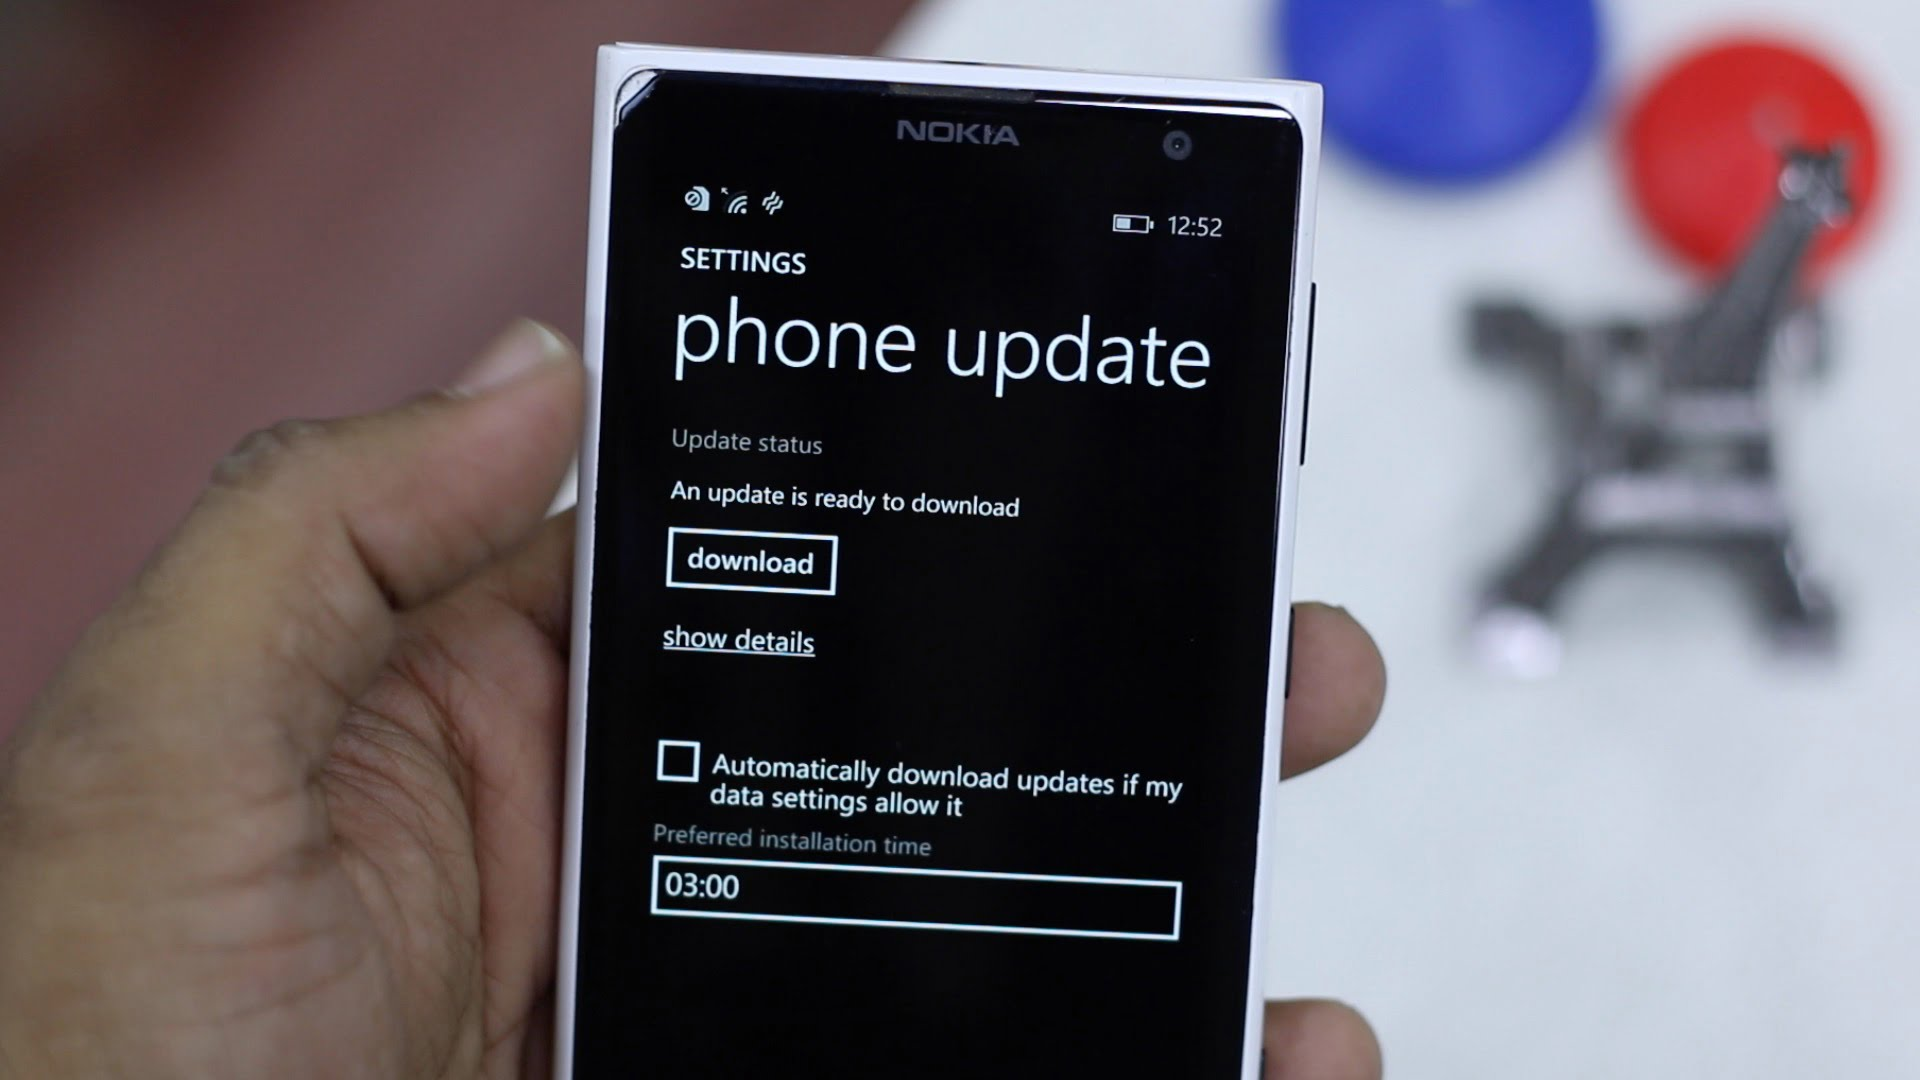 Use Windows 10 Upgrade Advisor to Upgrade to Windows 10 Mobile